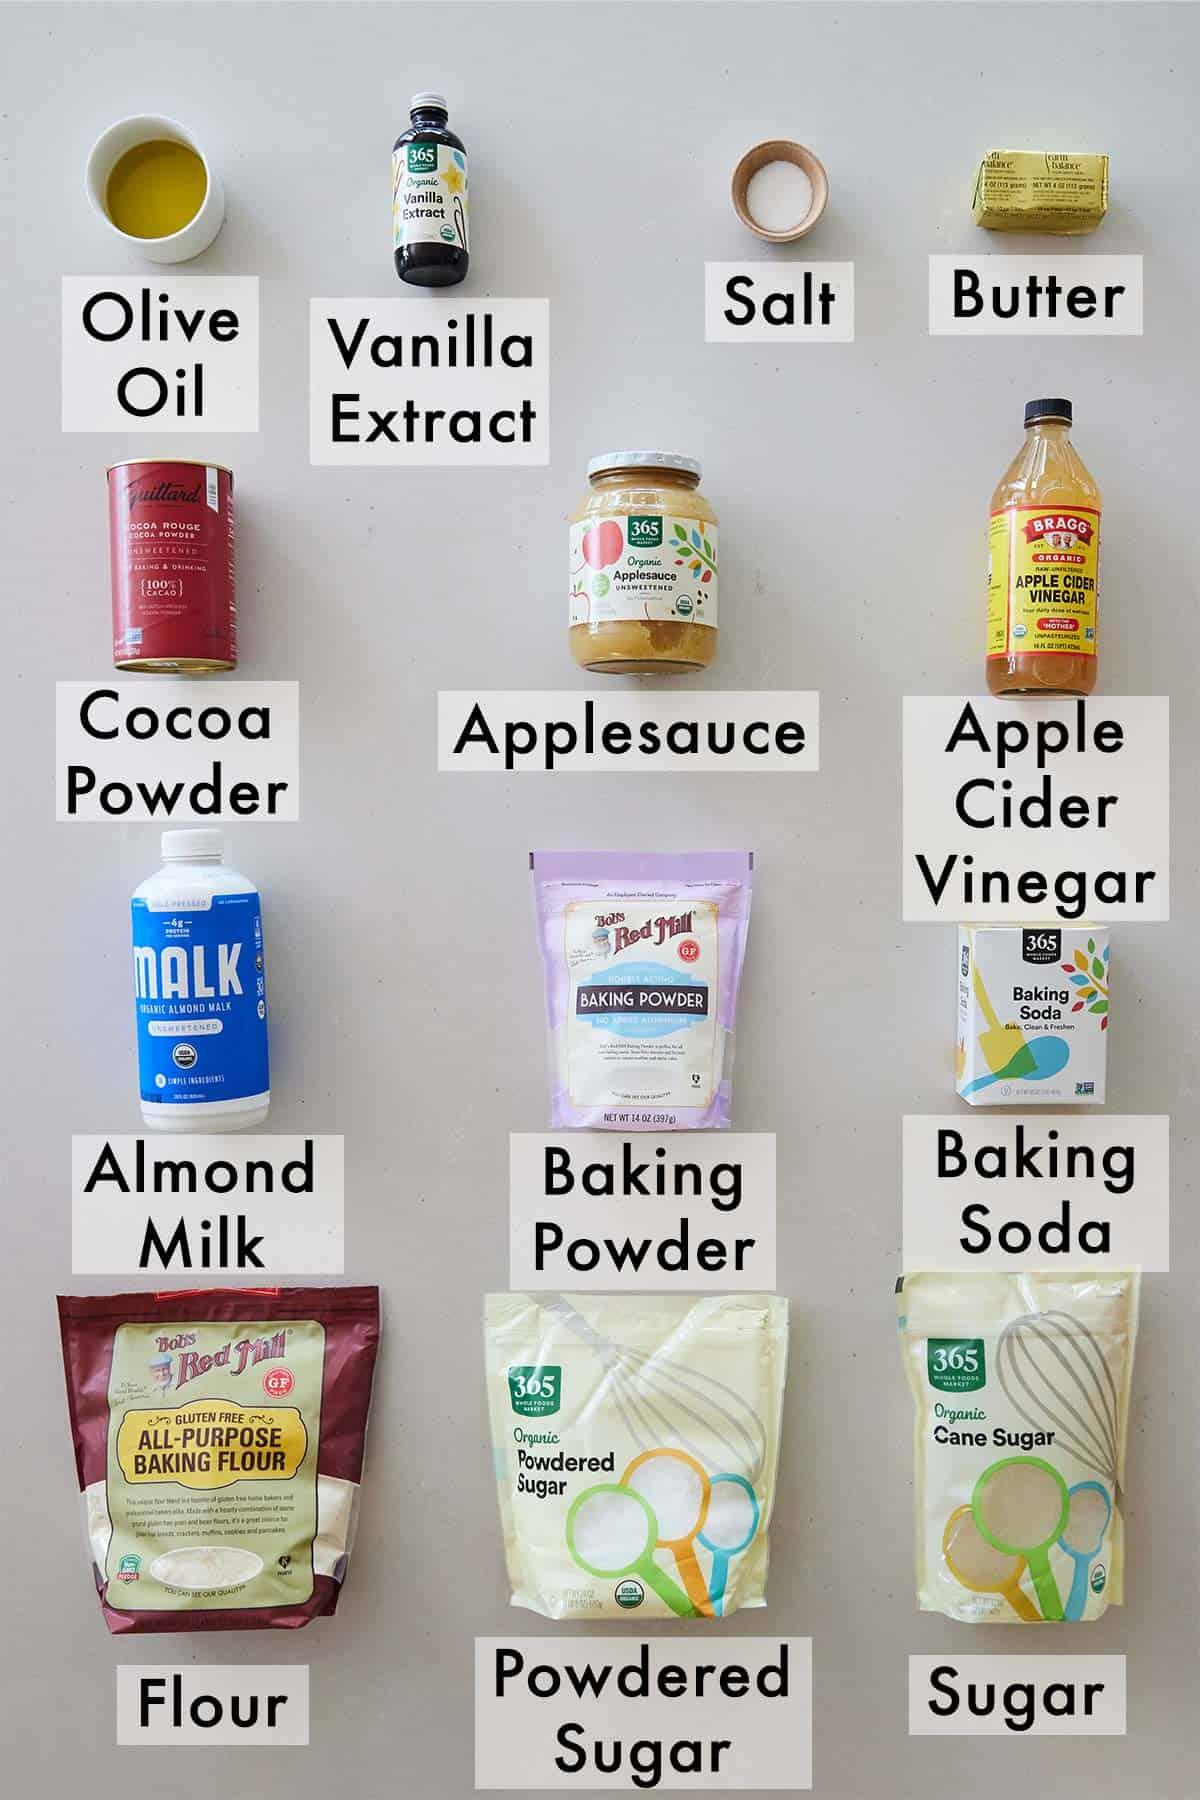 Ingredients needed to make a vegan chocolate cake.